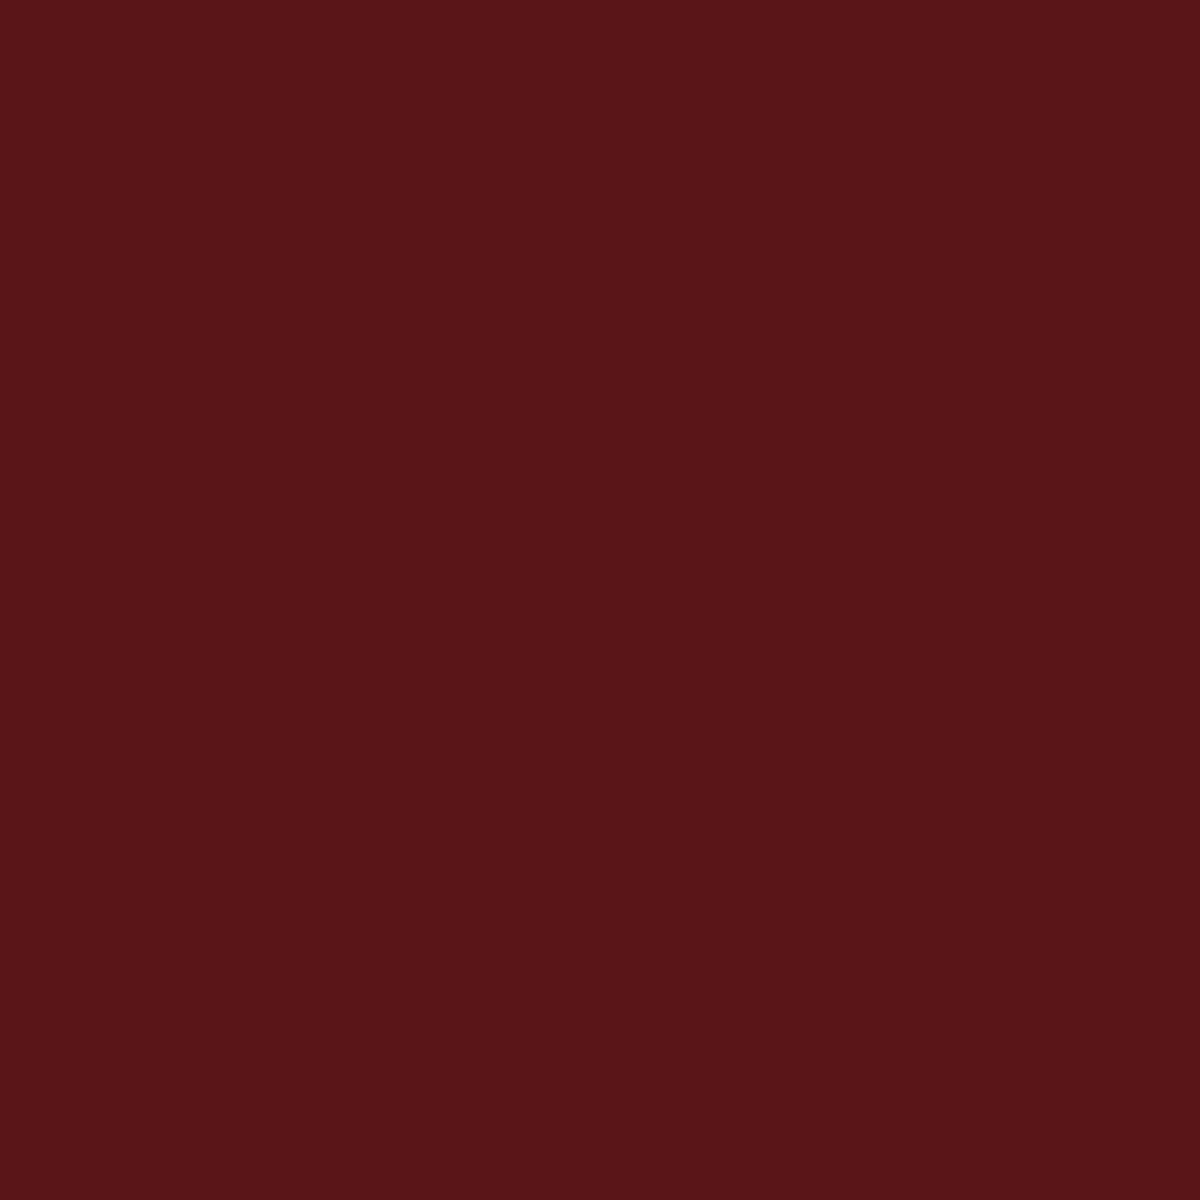 Виниловая самоклеющаяся пленка (глянец) G-3222 (1,06м х45,7м)